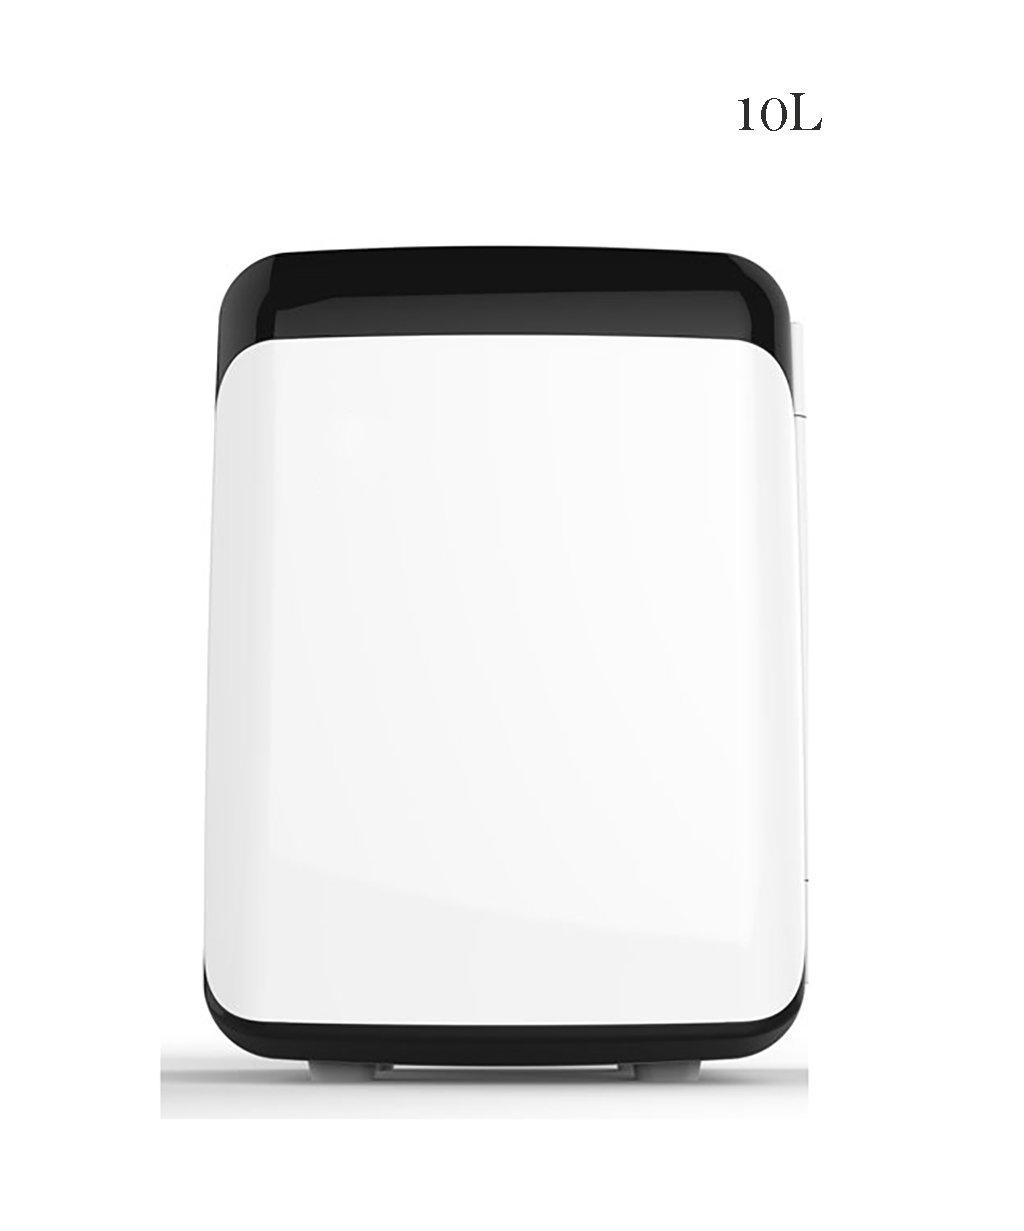 LIQICAI Elektrische Coolbox Kühlbox Kühlung Auto Mini Kühlschrank Kühler Warm/Cool für Home Auto Student Dormitory -12V DC 220V AC (Farbe : A)